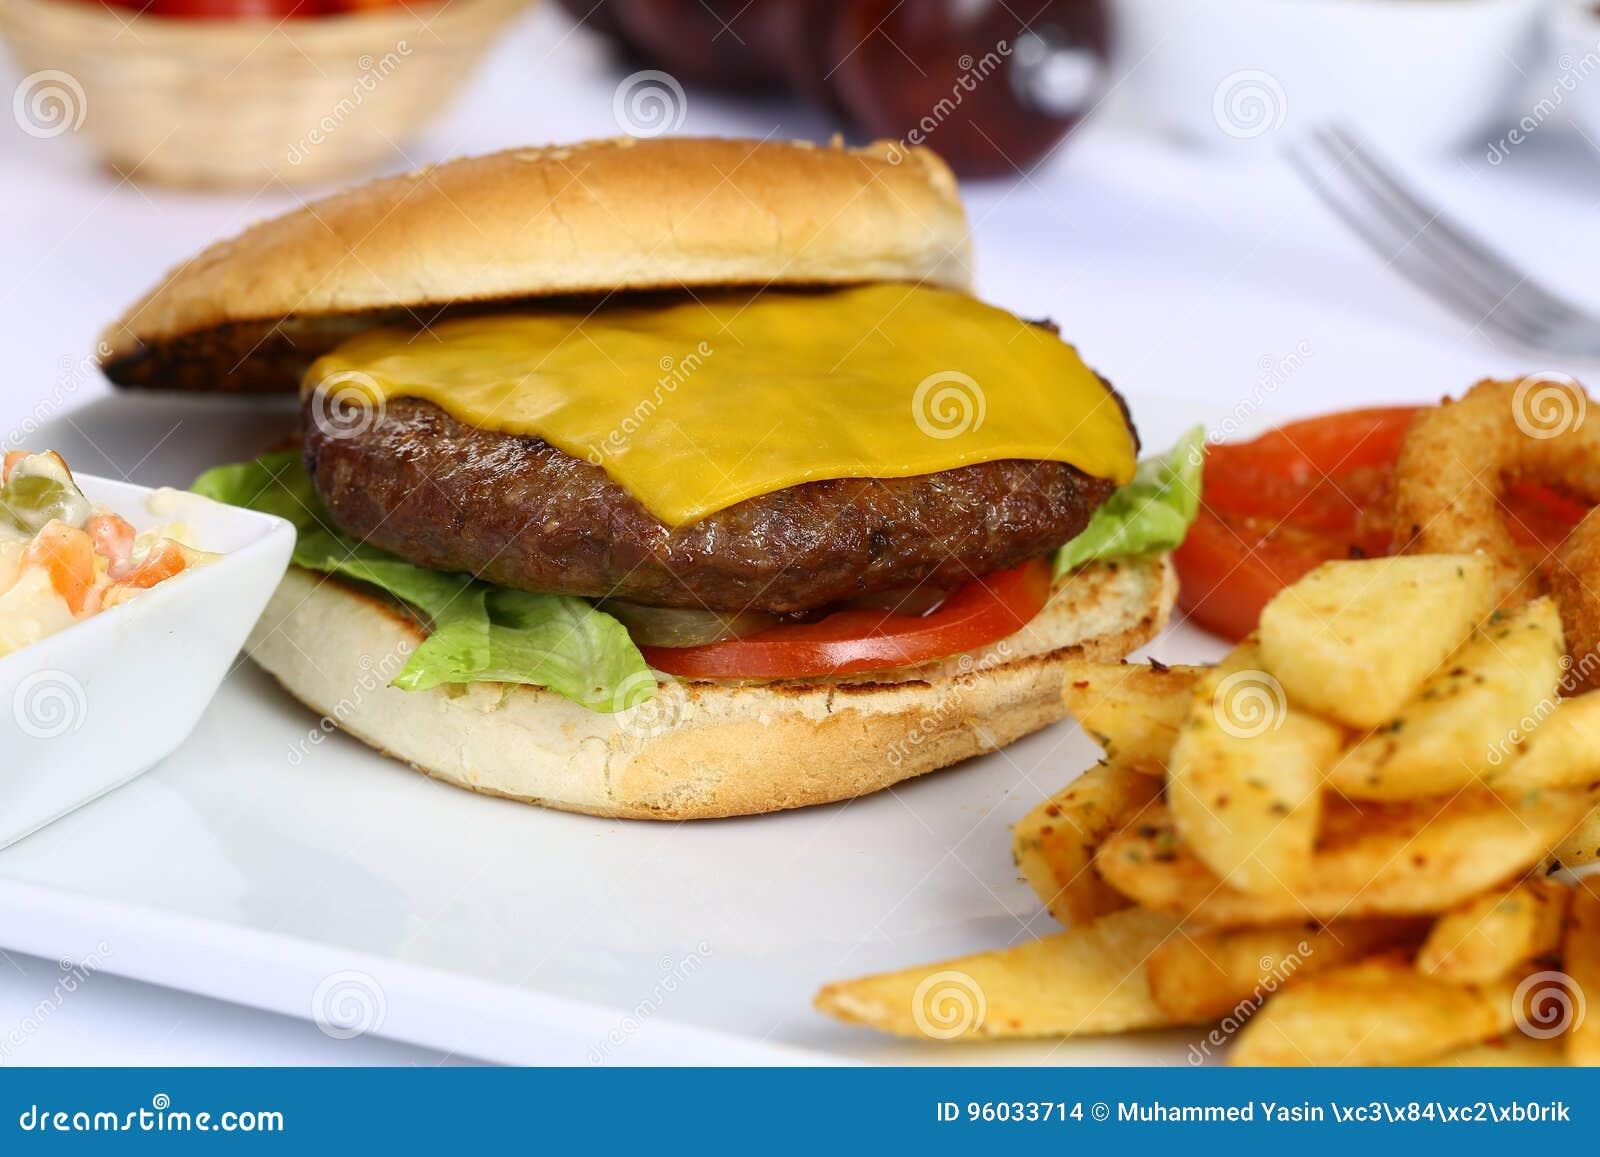 Cheeseburger i Francuza dłoniaki